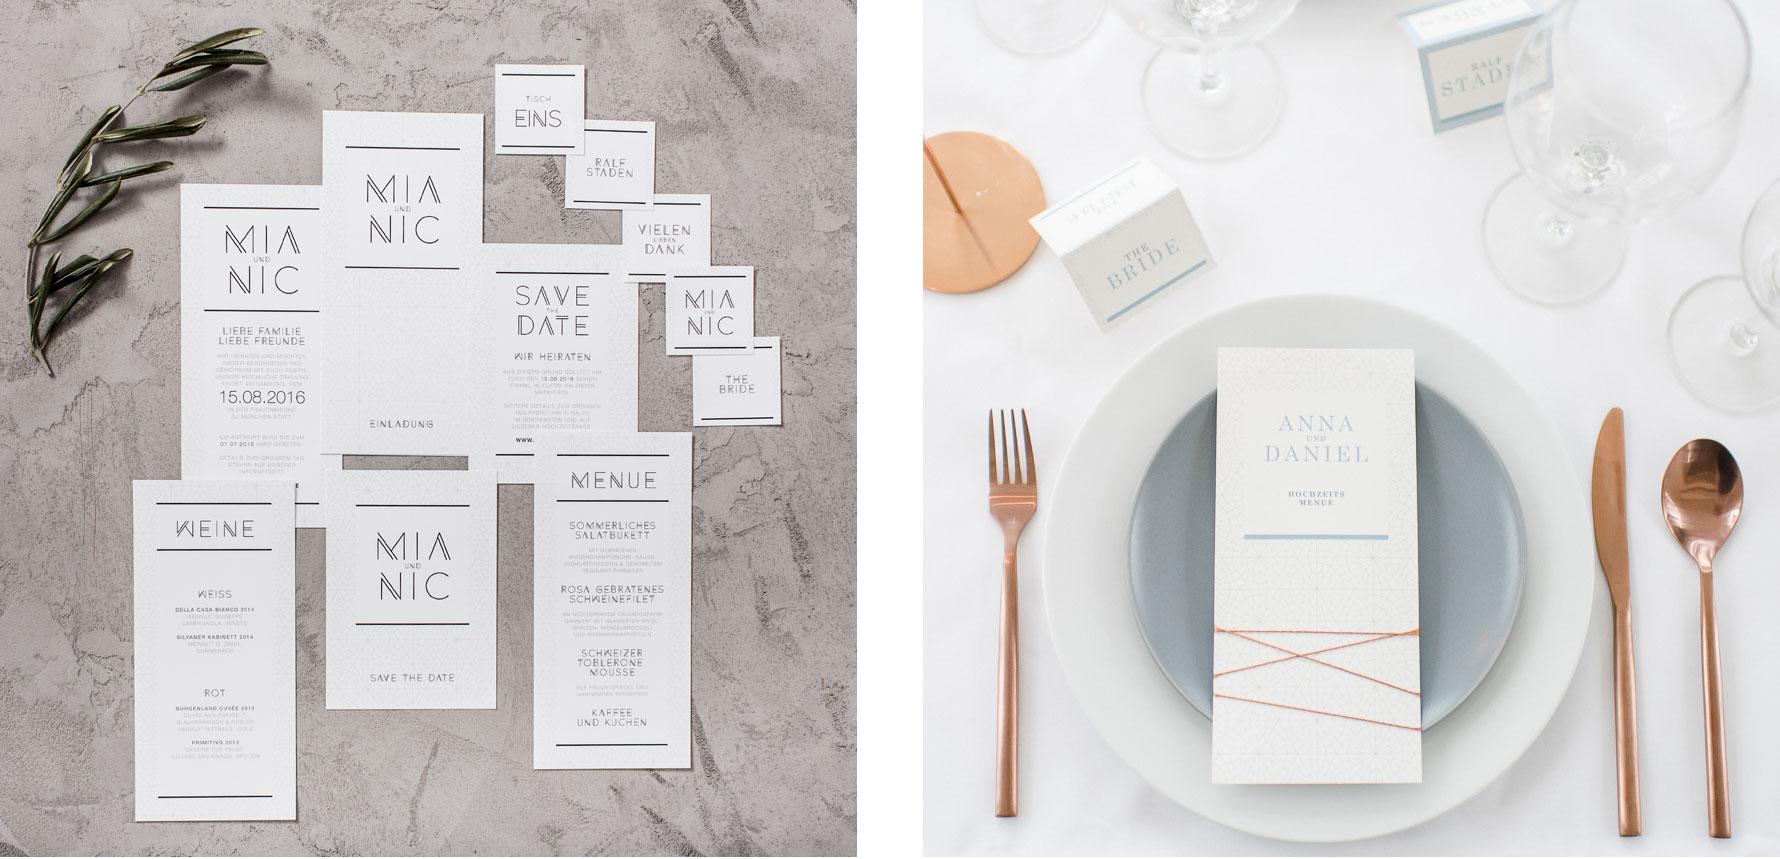 Hüfner Design | Referenz WeddingEve | Corporate Identity | Papeterie